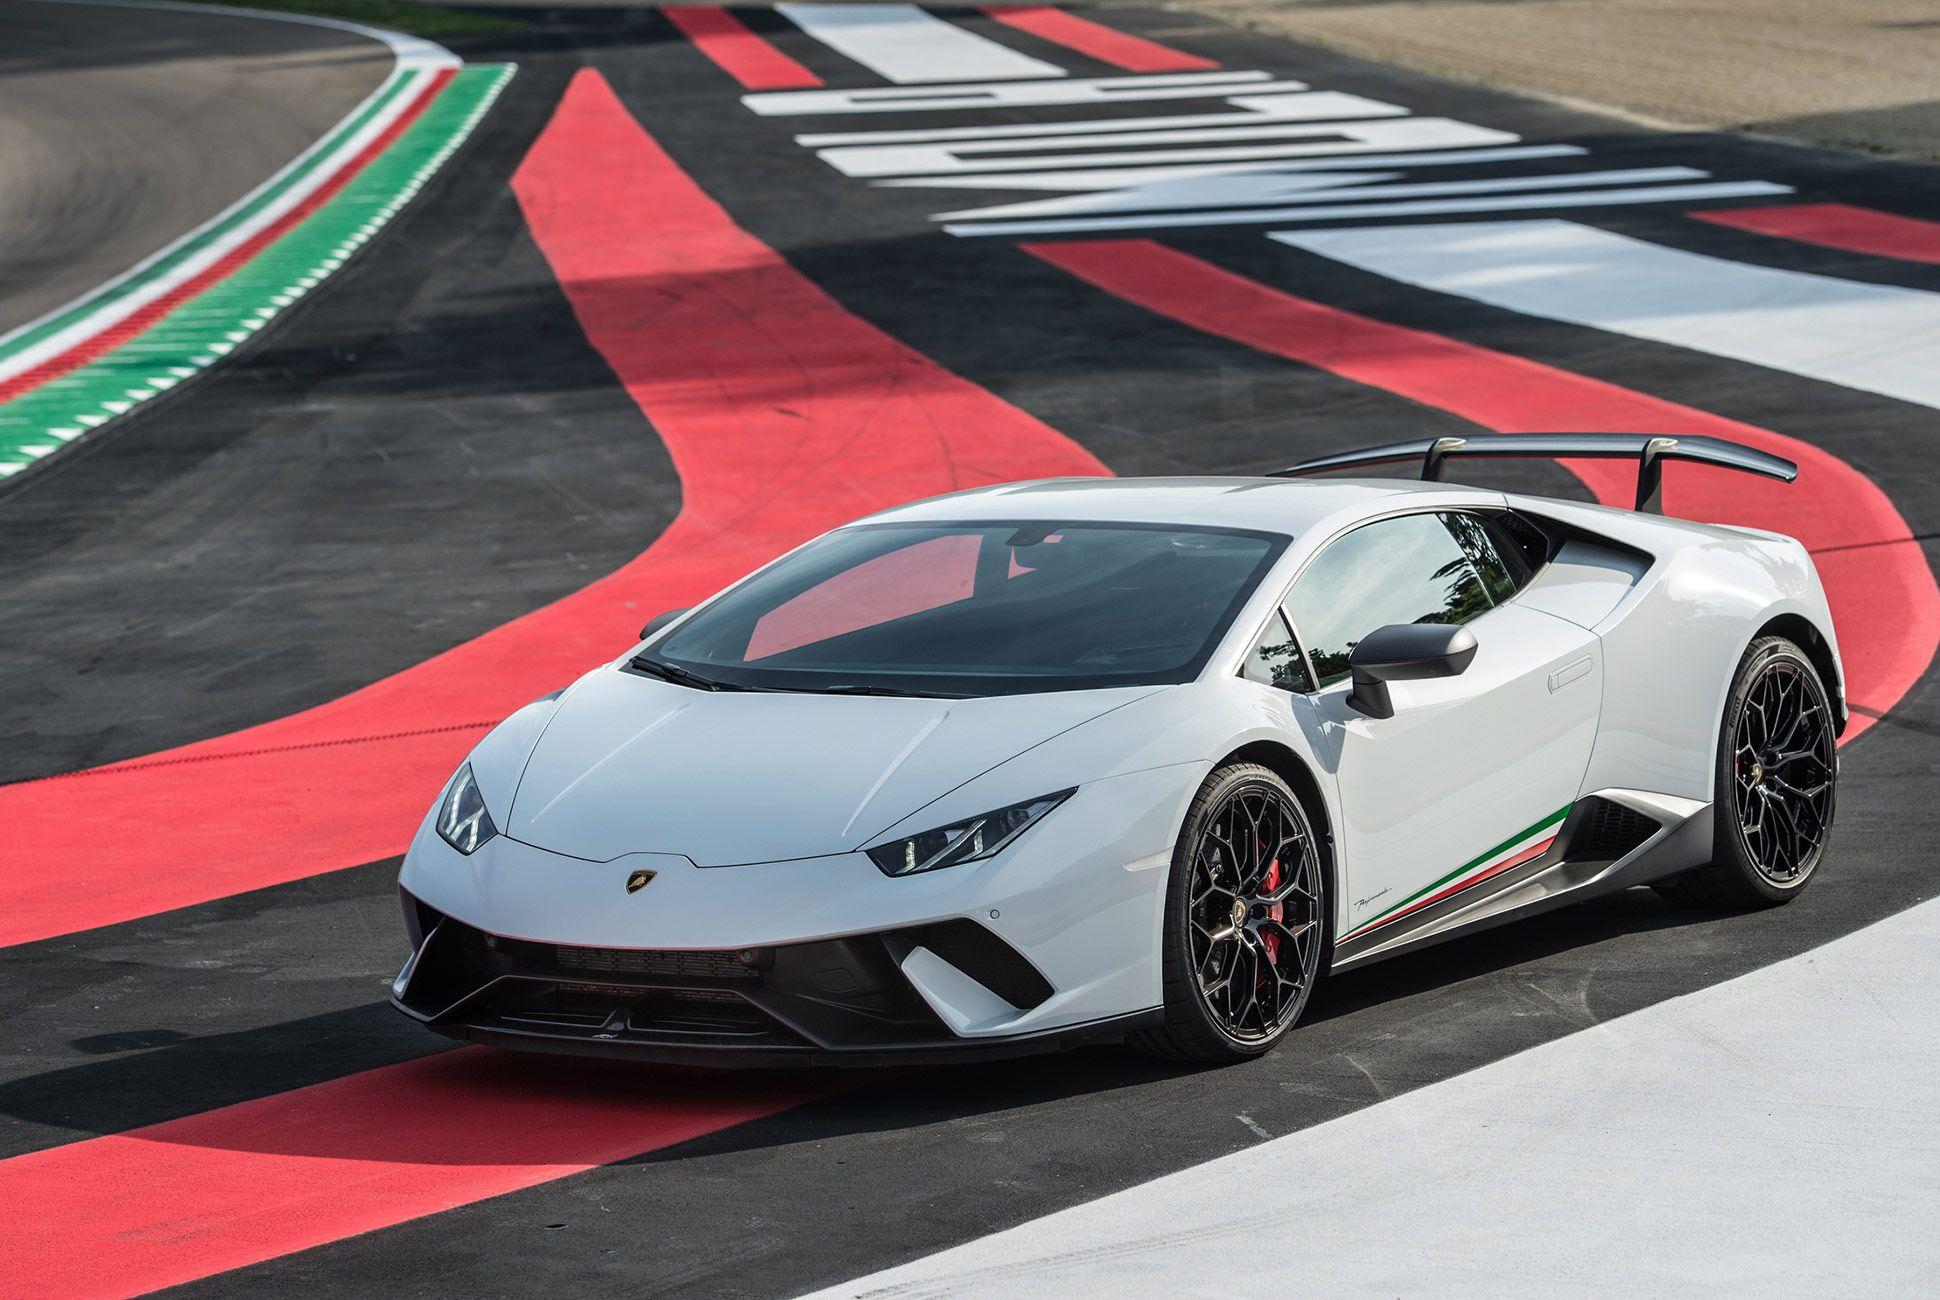 The Best Car Of 2018 According To Jeremy Clarkson Lamborghini Huracan Super Luxury Cars Lamborghini Cars